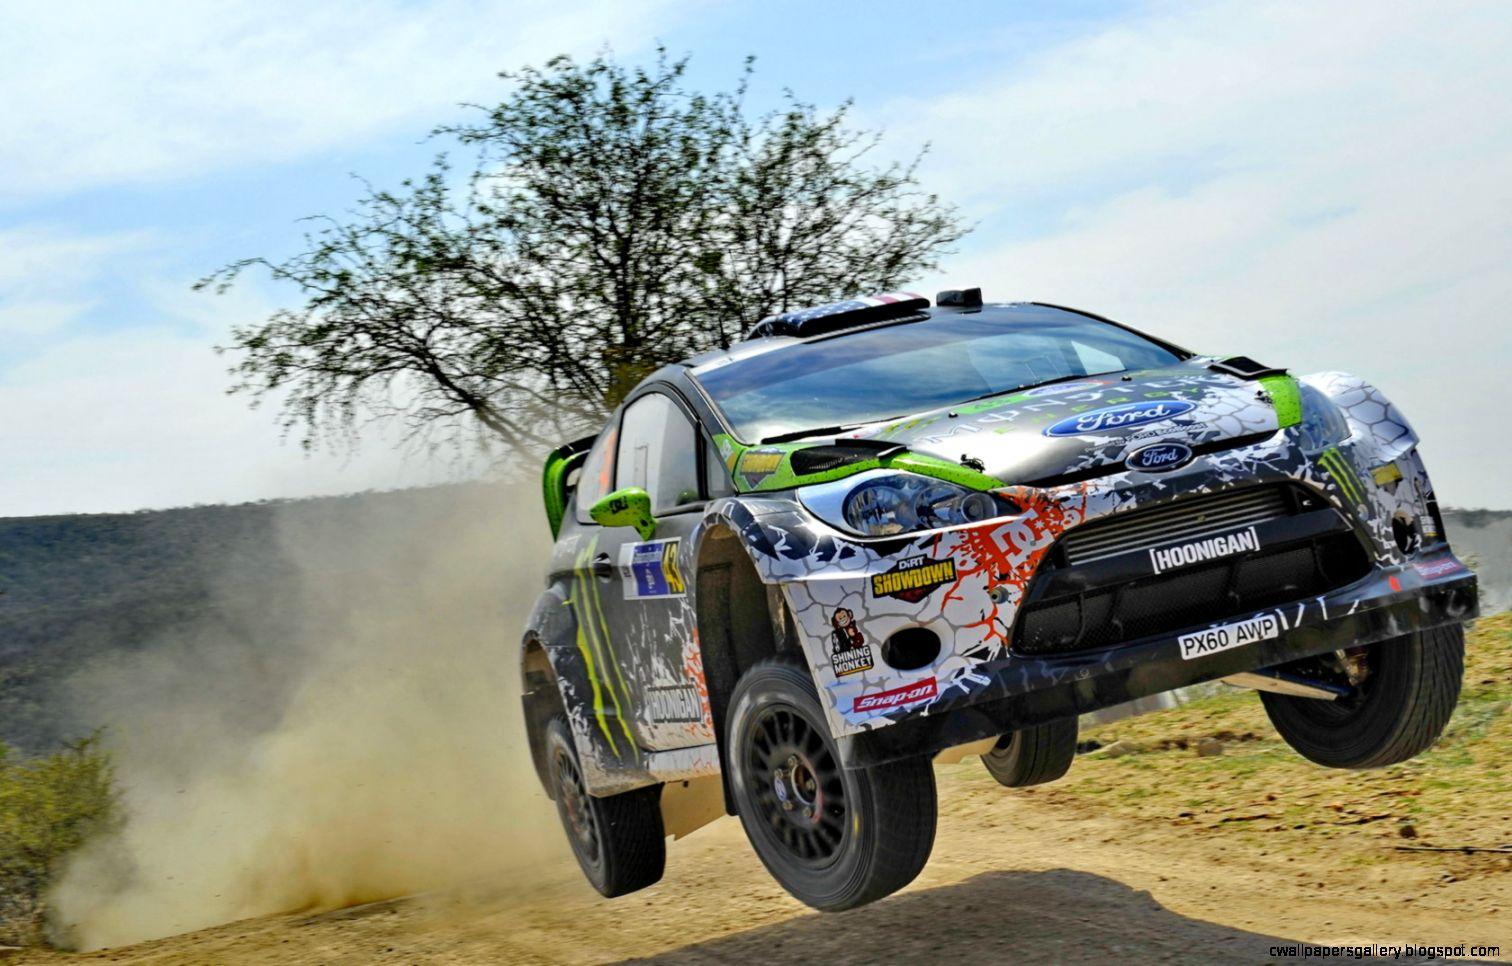 ken block rally car jump amazing s